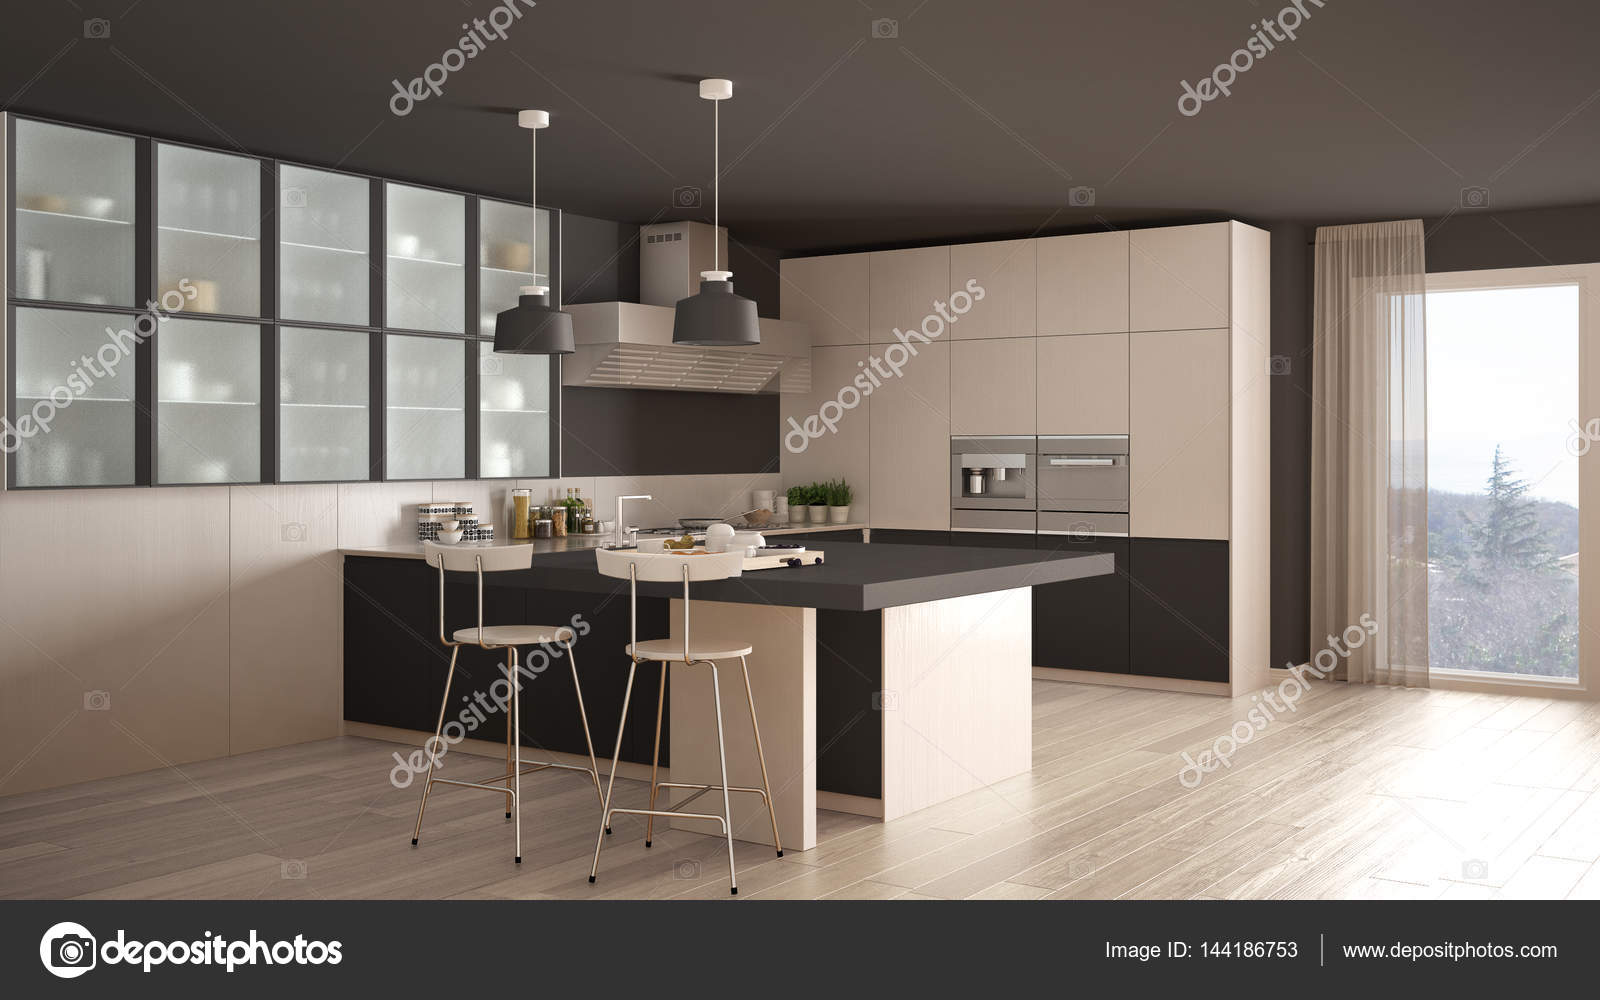 gray kitchen floor laminate countertop 经典的最小白色和灰色厨房 镶木地板 现代 图库照片 c archiviz 144186753